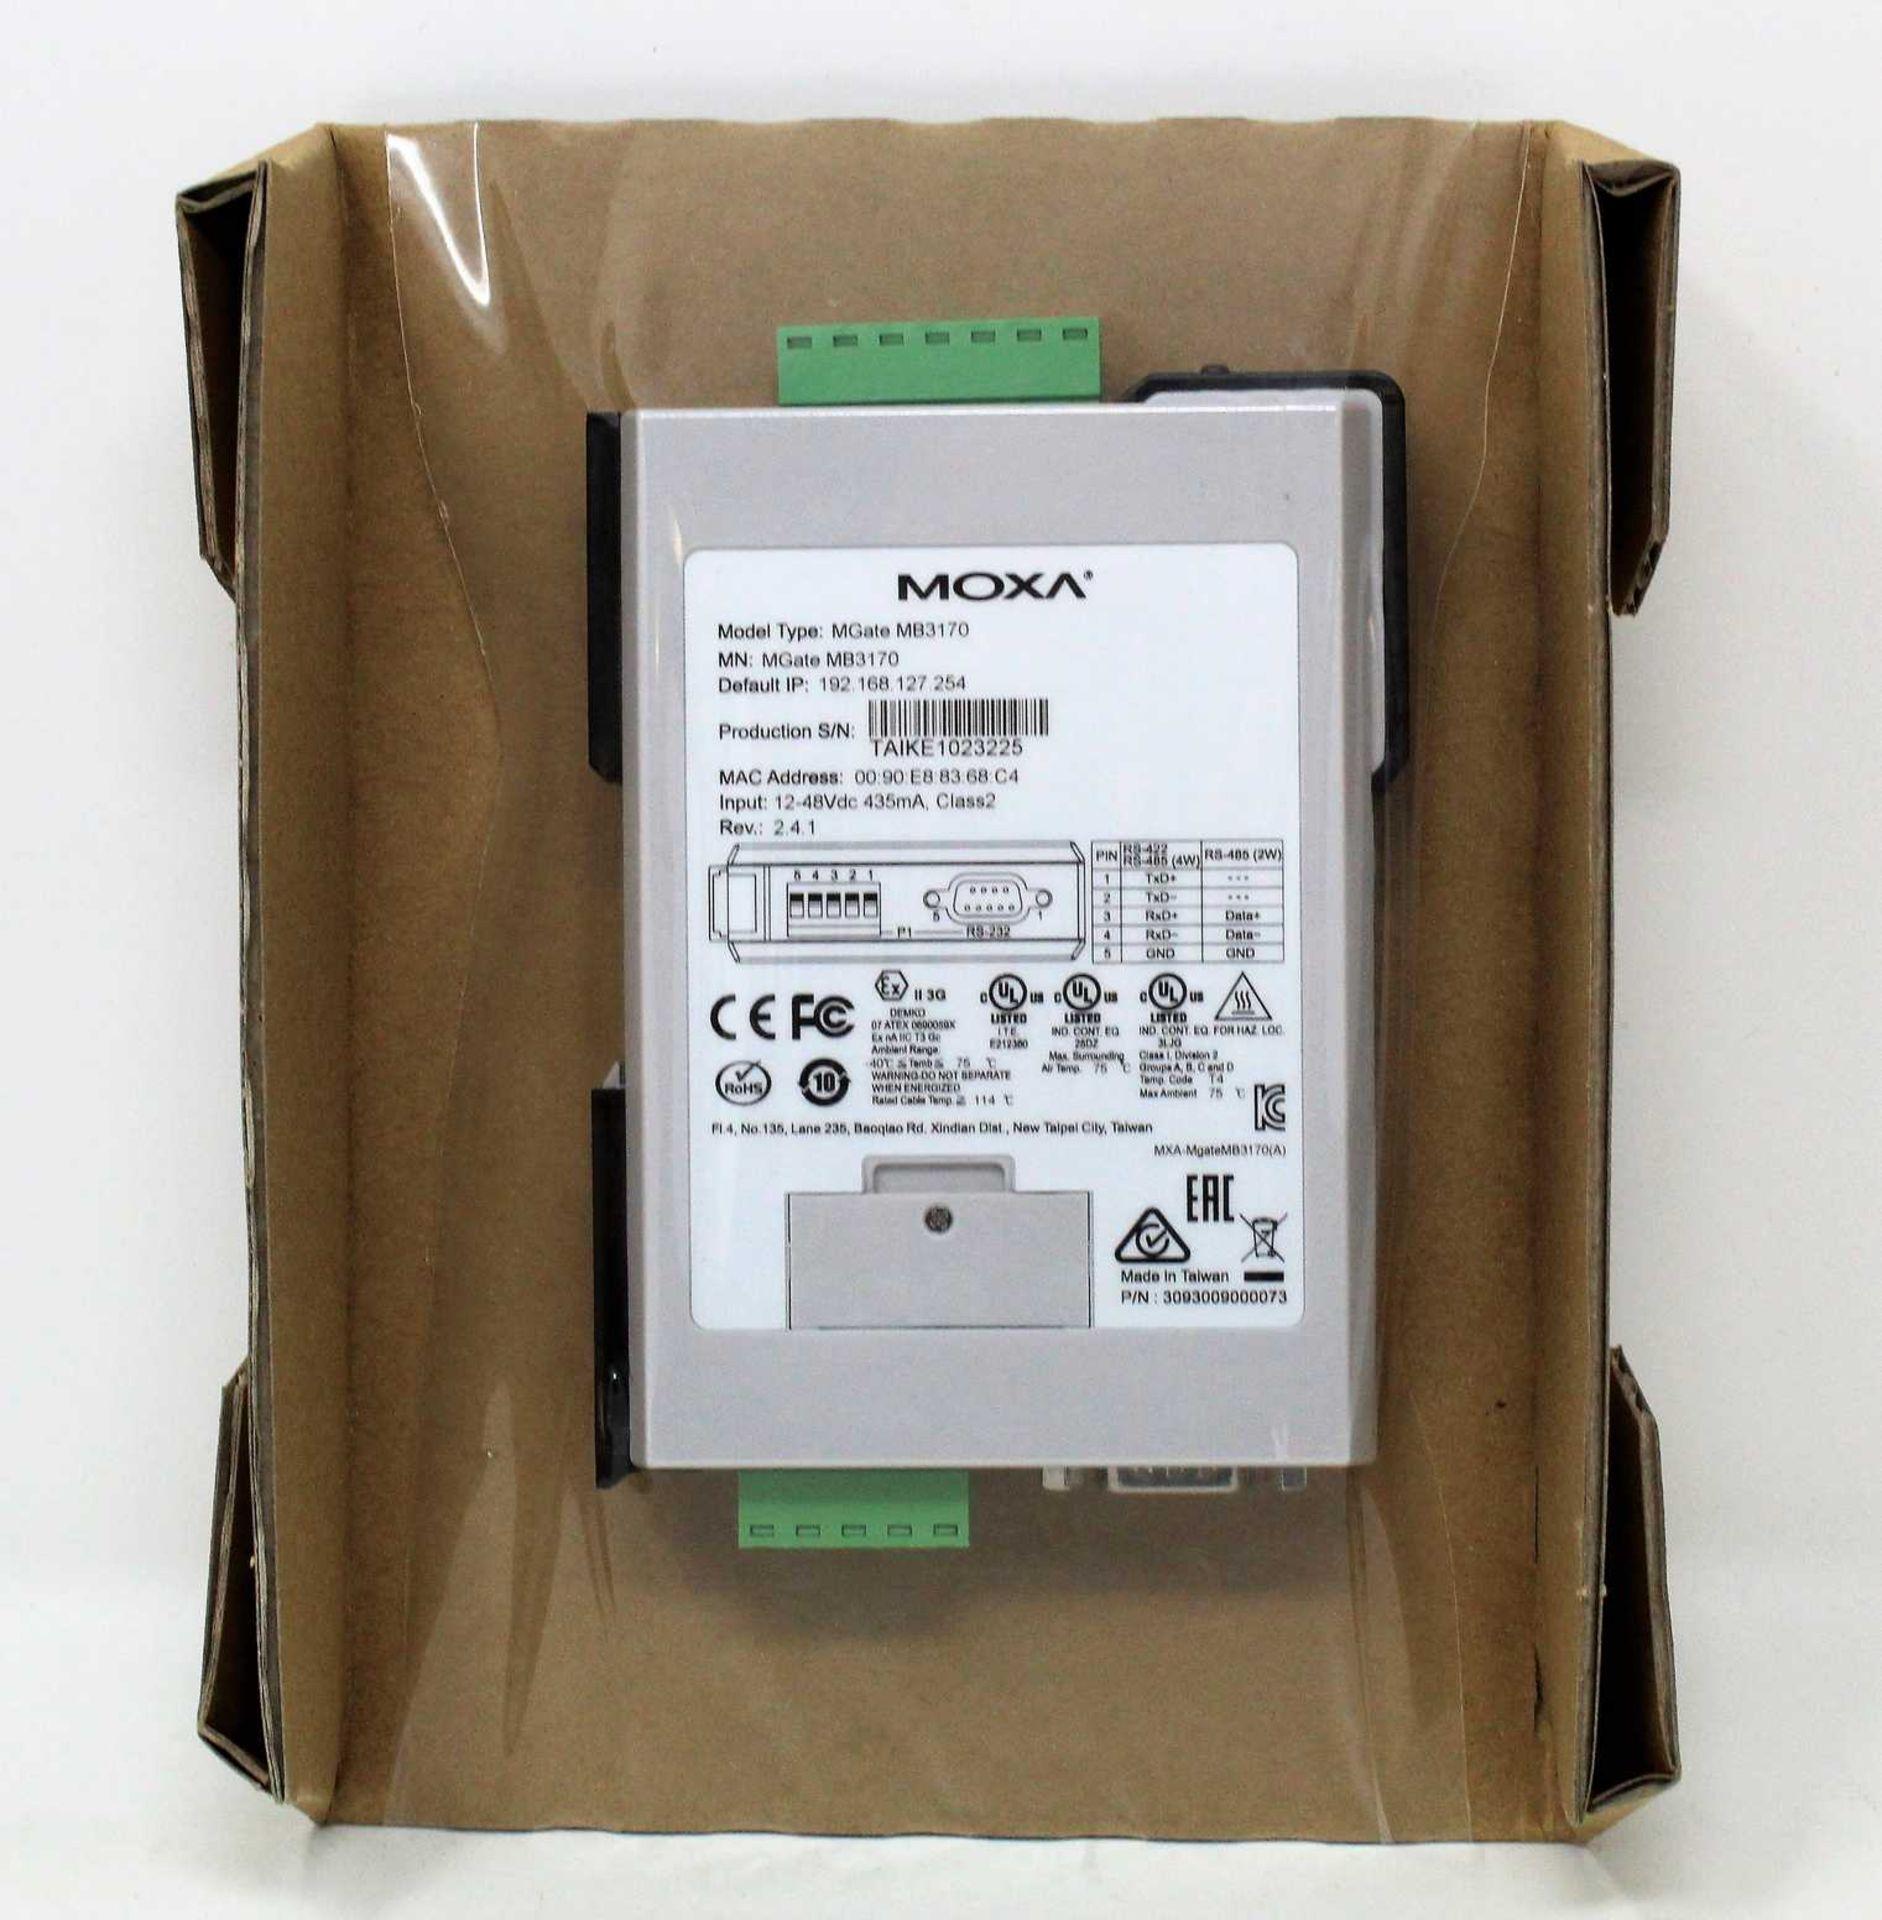 A boxed as new Moxa MGate MB3170 V2.4.1 Advanced Serial-to-Ethernet Modbus Gateway (P/N: